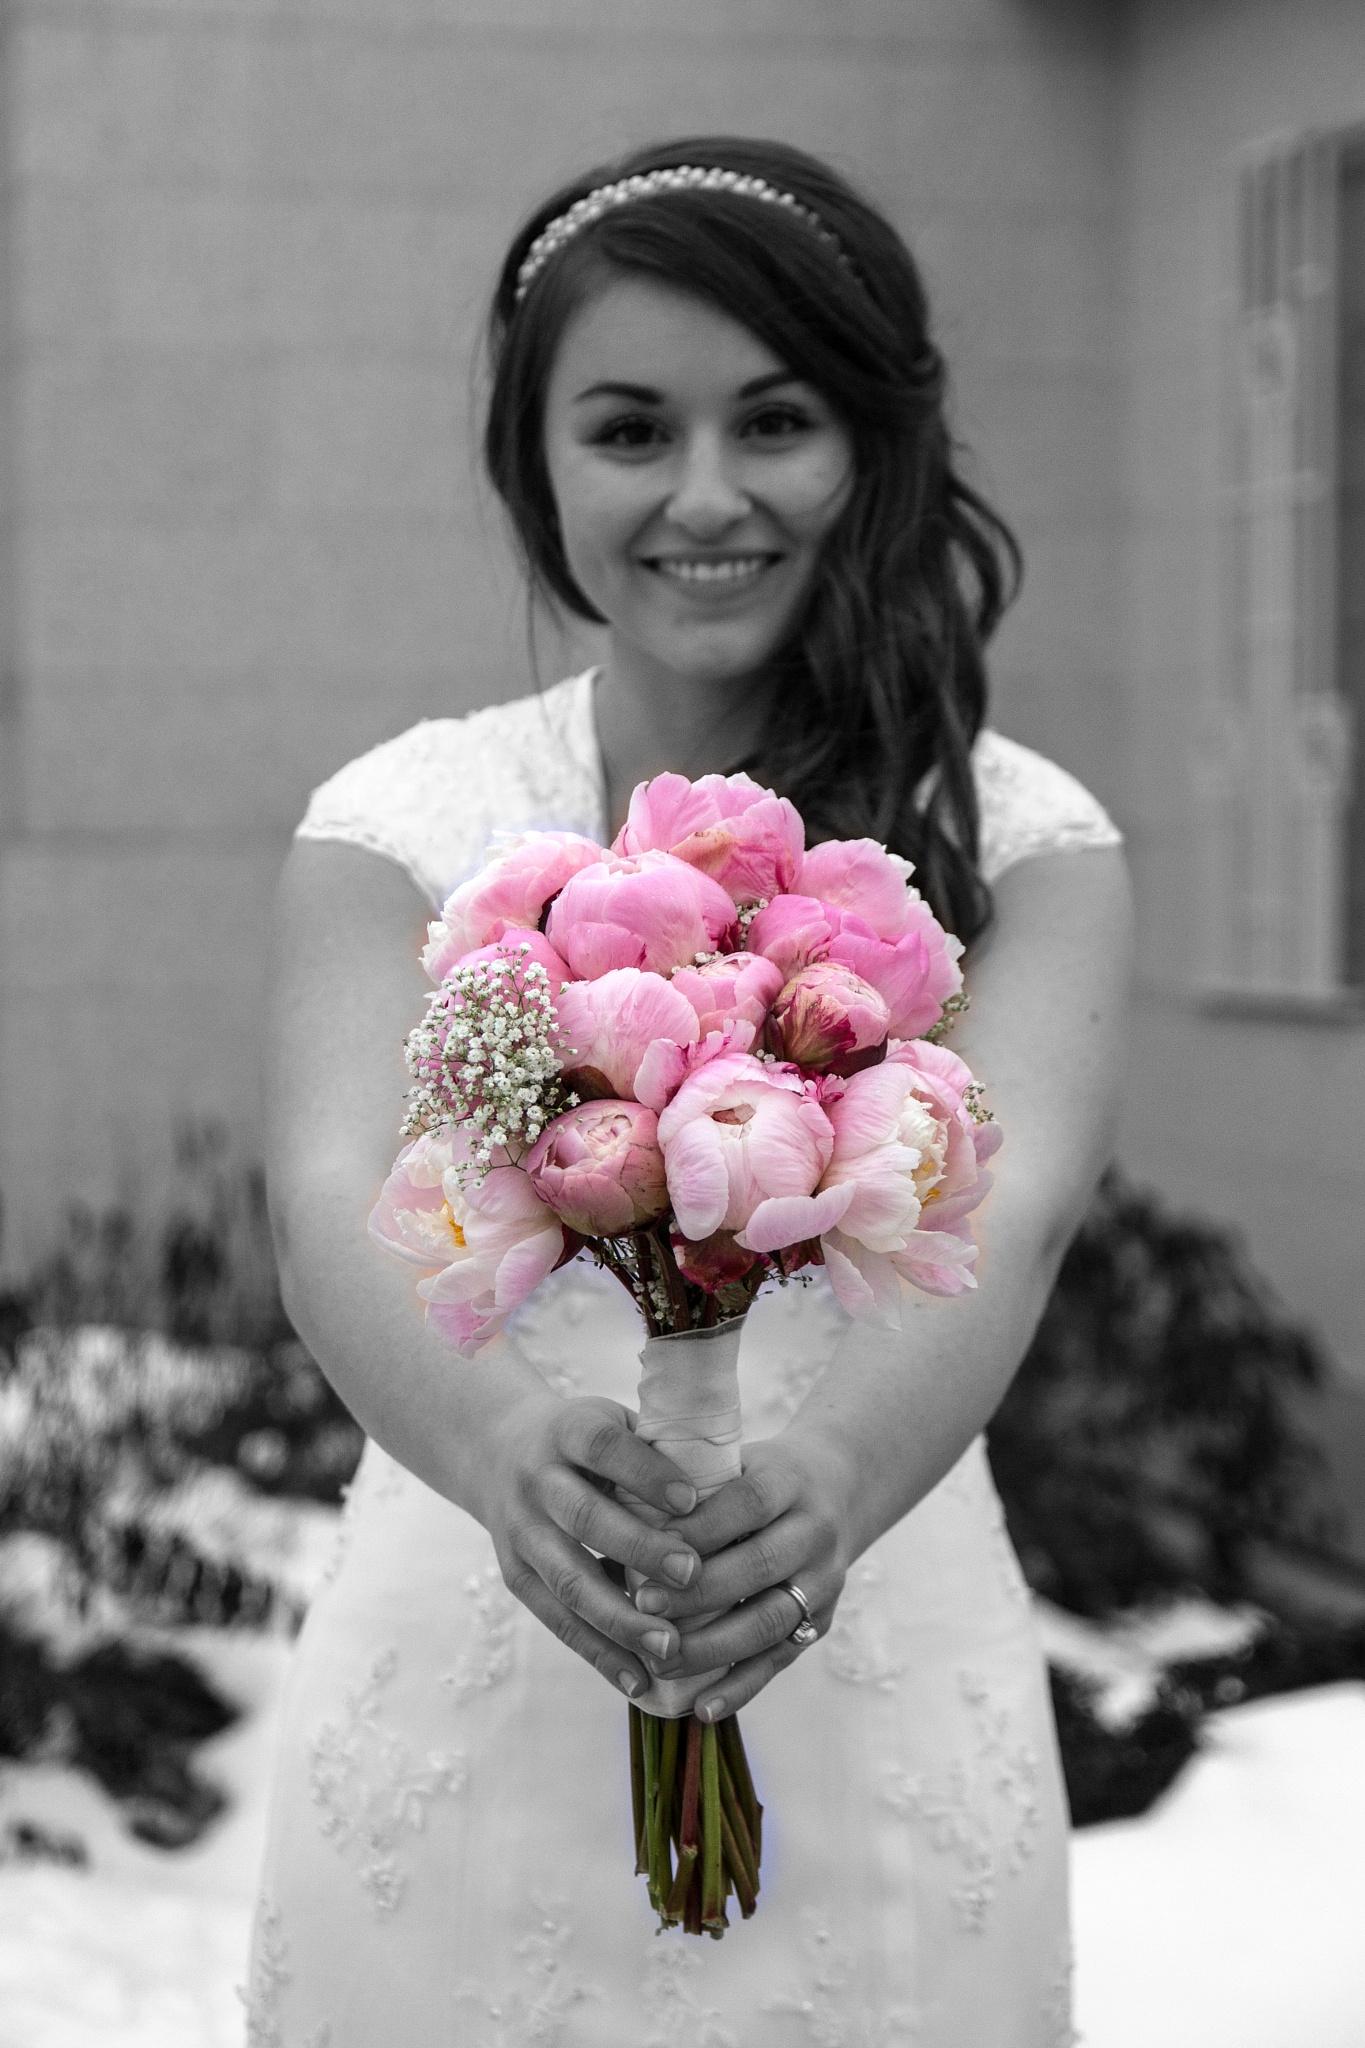 The Bride's Bouquet by Mark E. Anderson